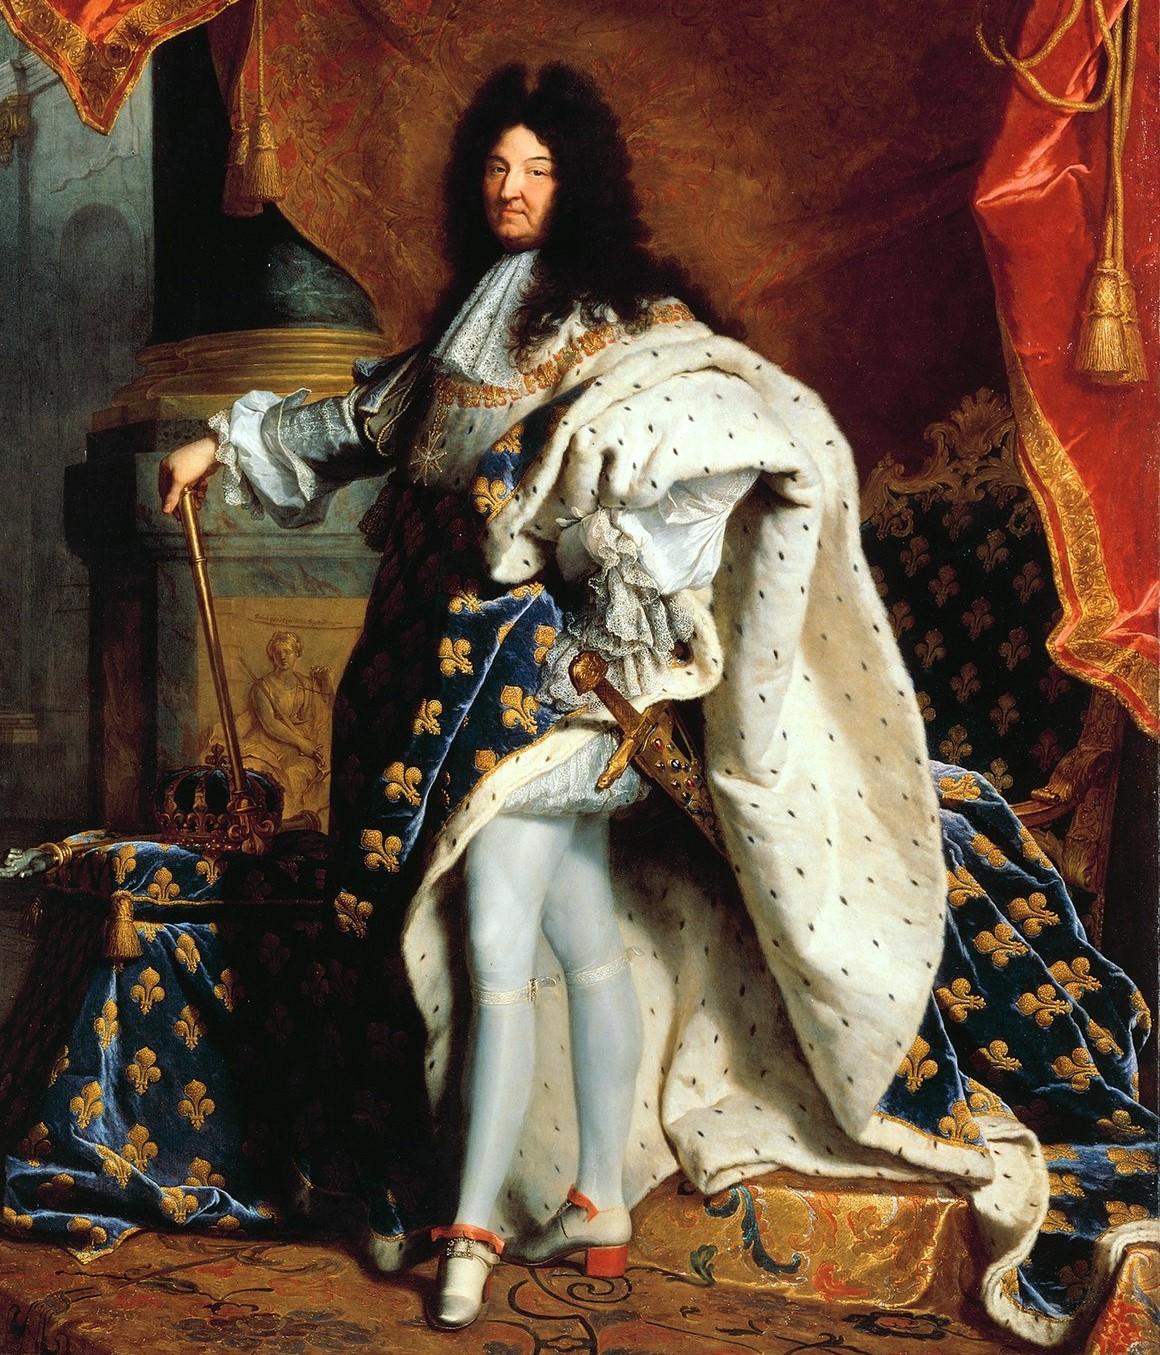 Luis XIV, en plan sencillito.